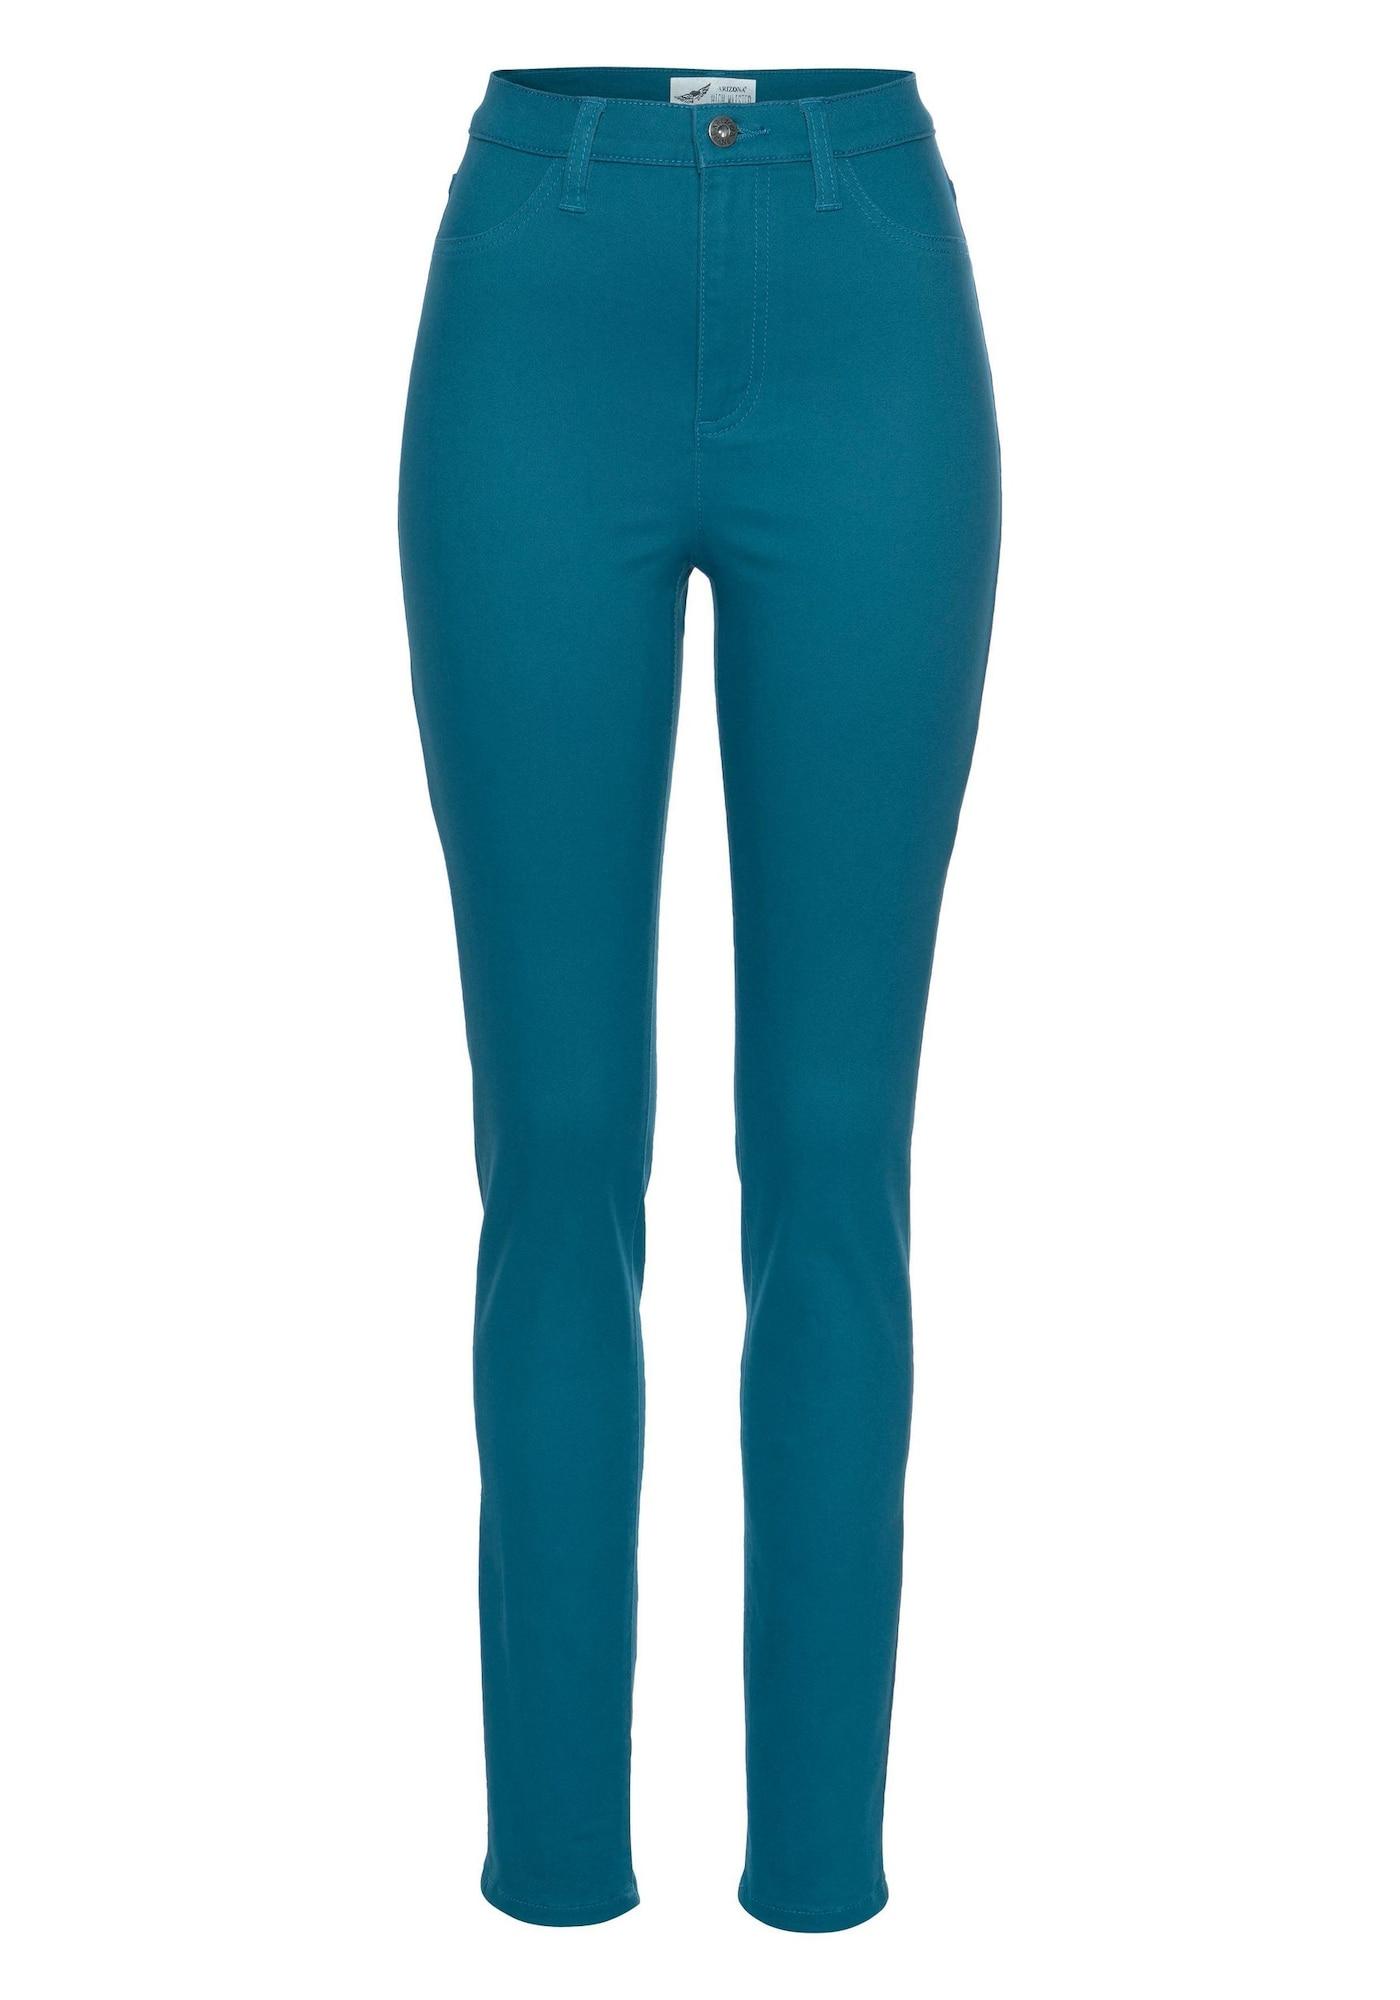 Jeansjeggings 'in Coloured-Denim' | Bekleidung > Jeans > Jeggings | Petrol | ARIZONA